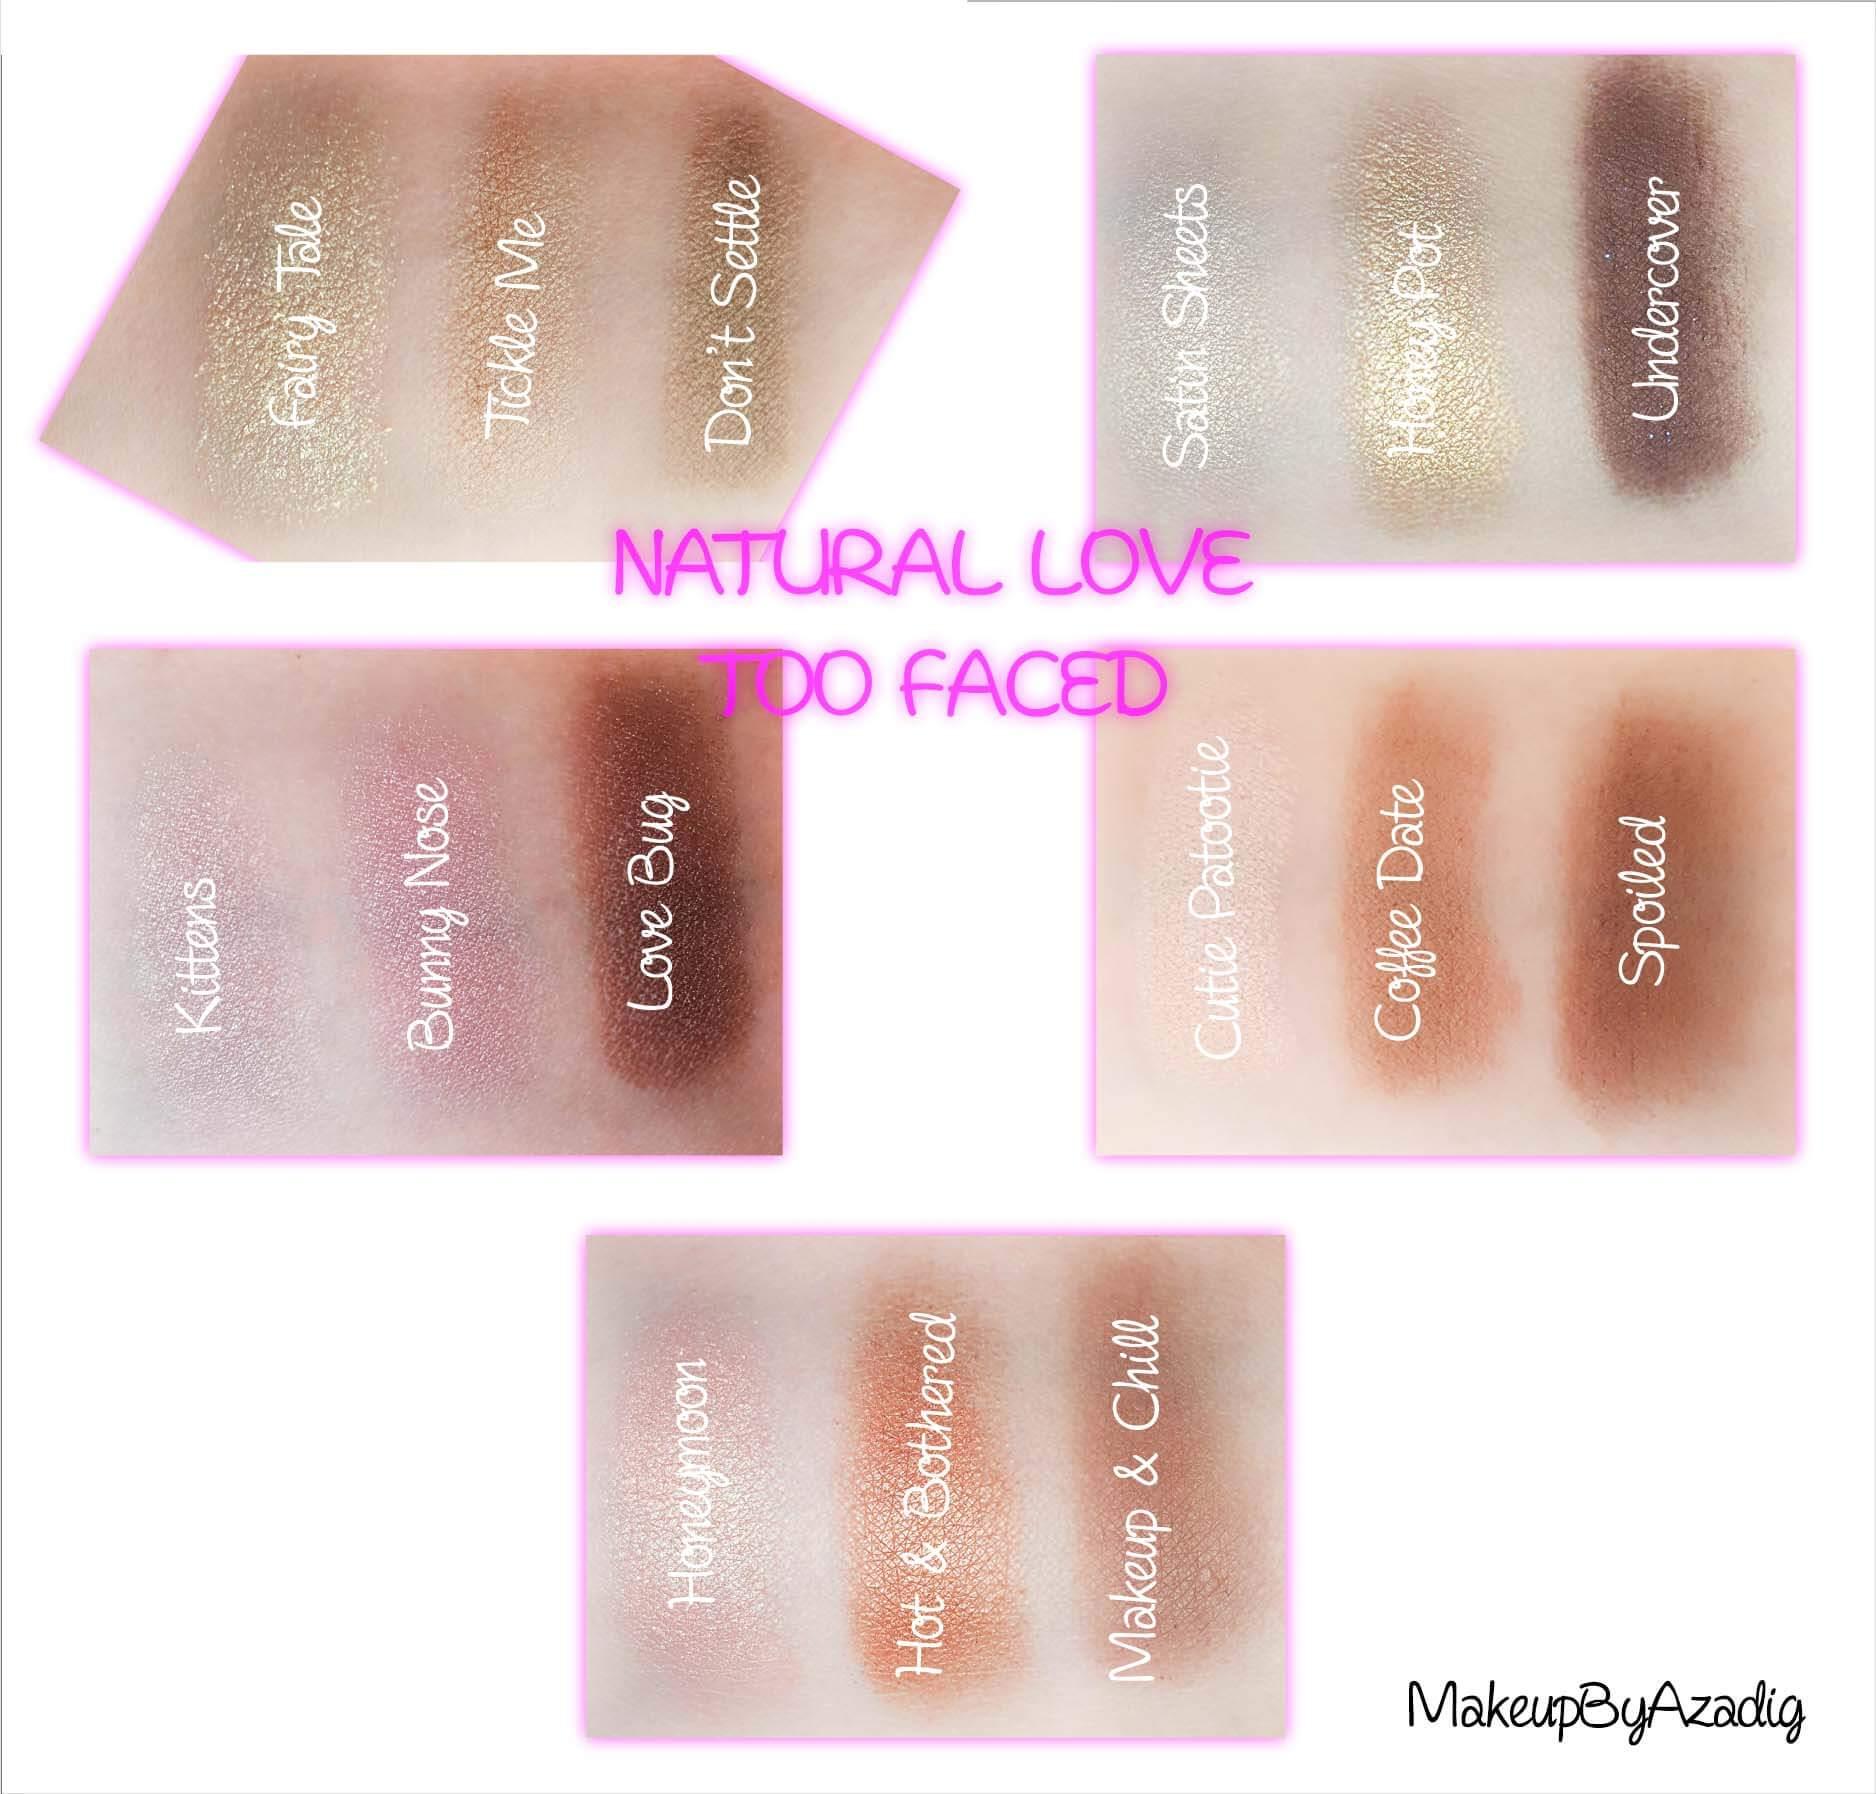 revue-review-palette-natural-love-too-faced-usa-france-disponible-sephora-blog-makeupbyazadig-avis-swatch-prix